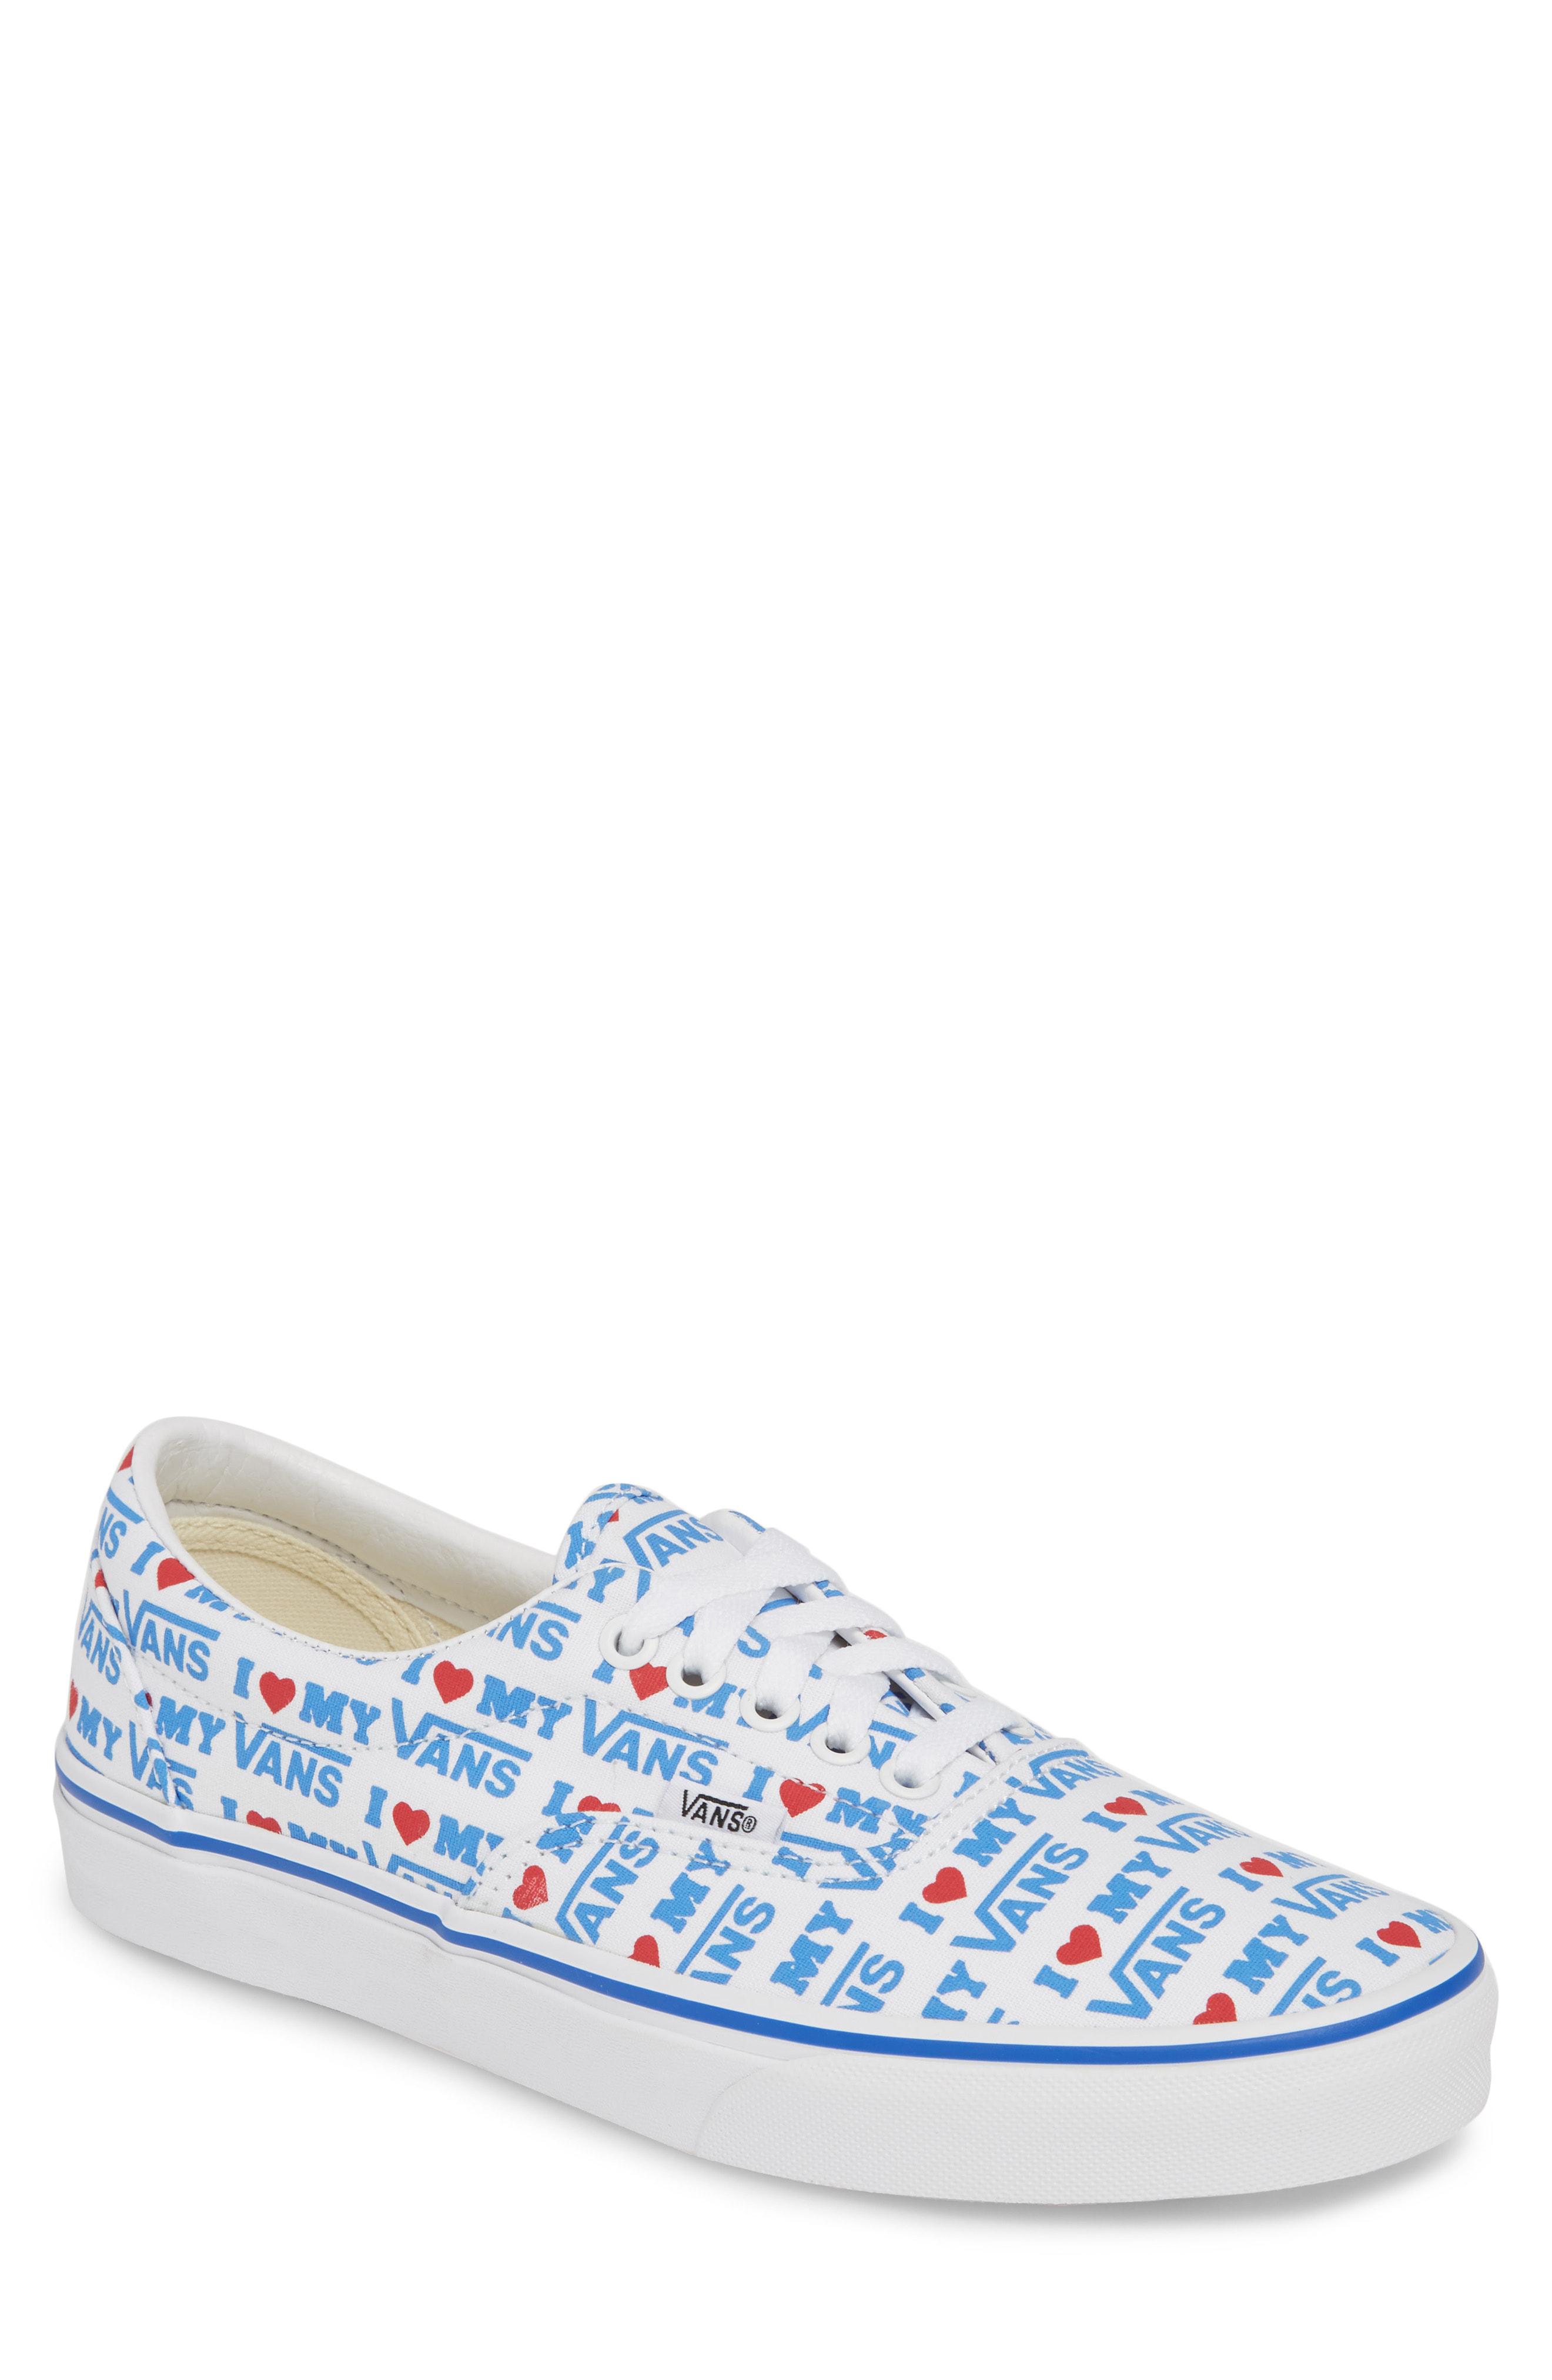 Vans  Era  Sneaker In I Heart True White  f4501e149